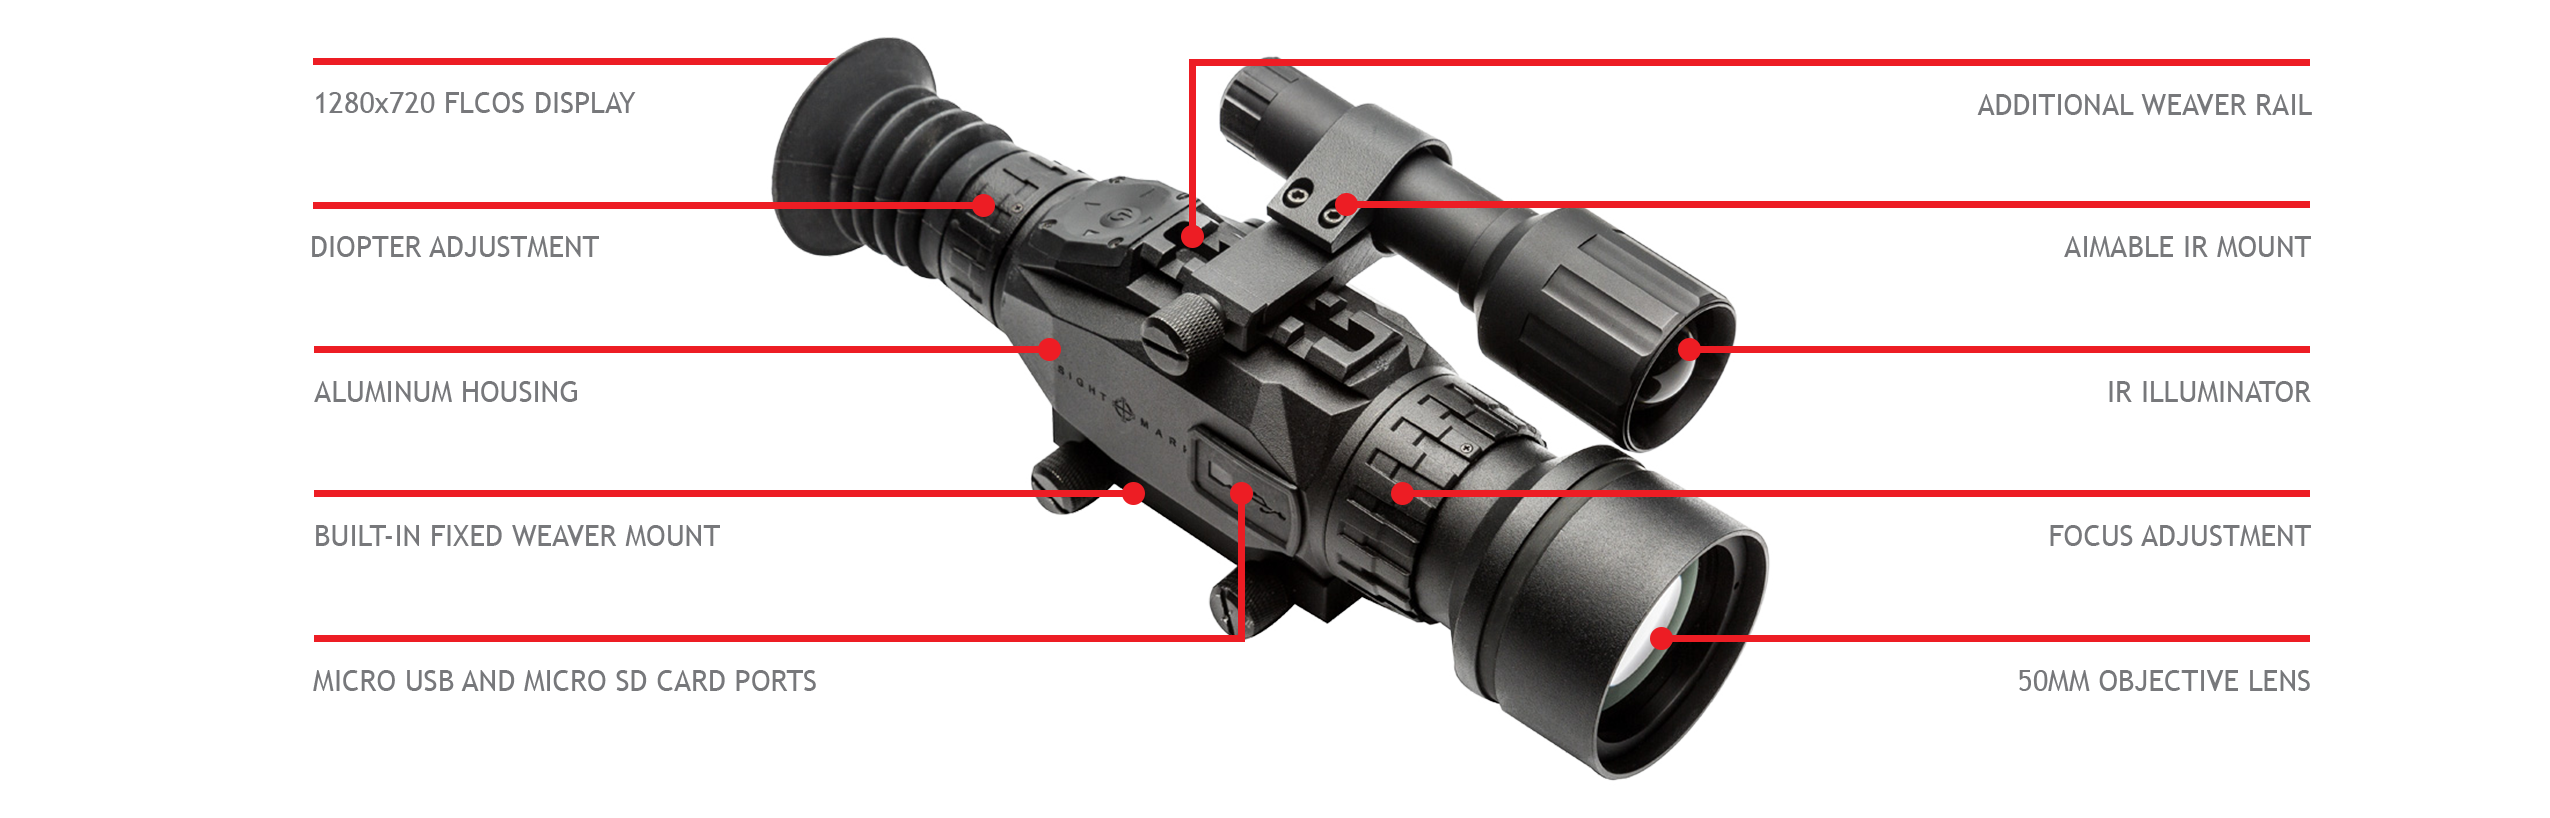 Sightmark Wraith HD 4-32x50 Digital Riflescope-sm18011-3.png